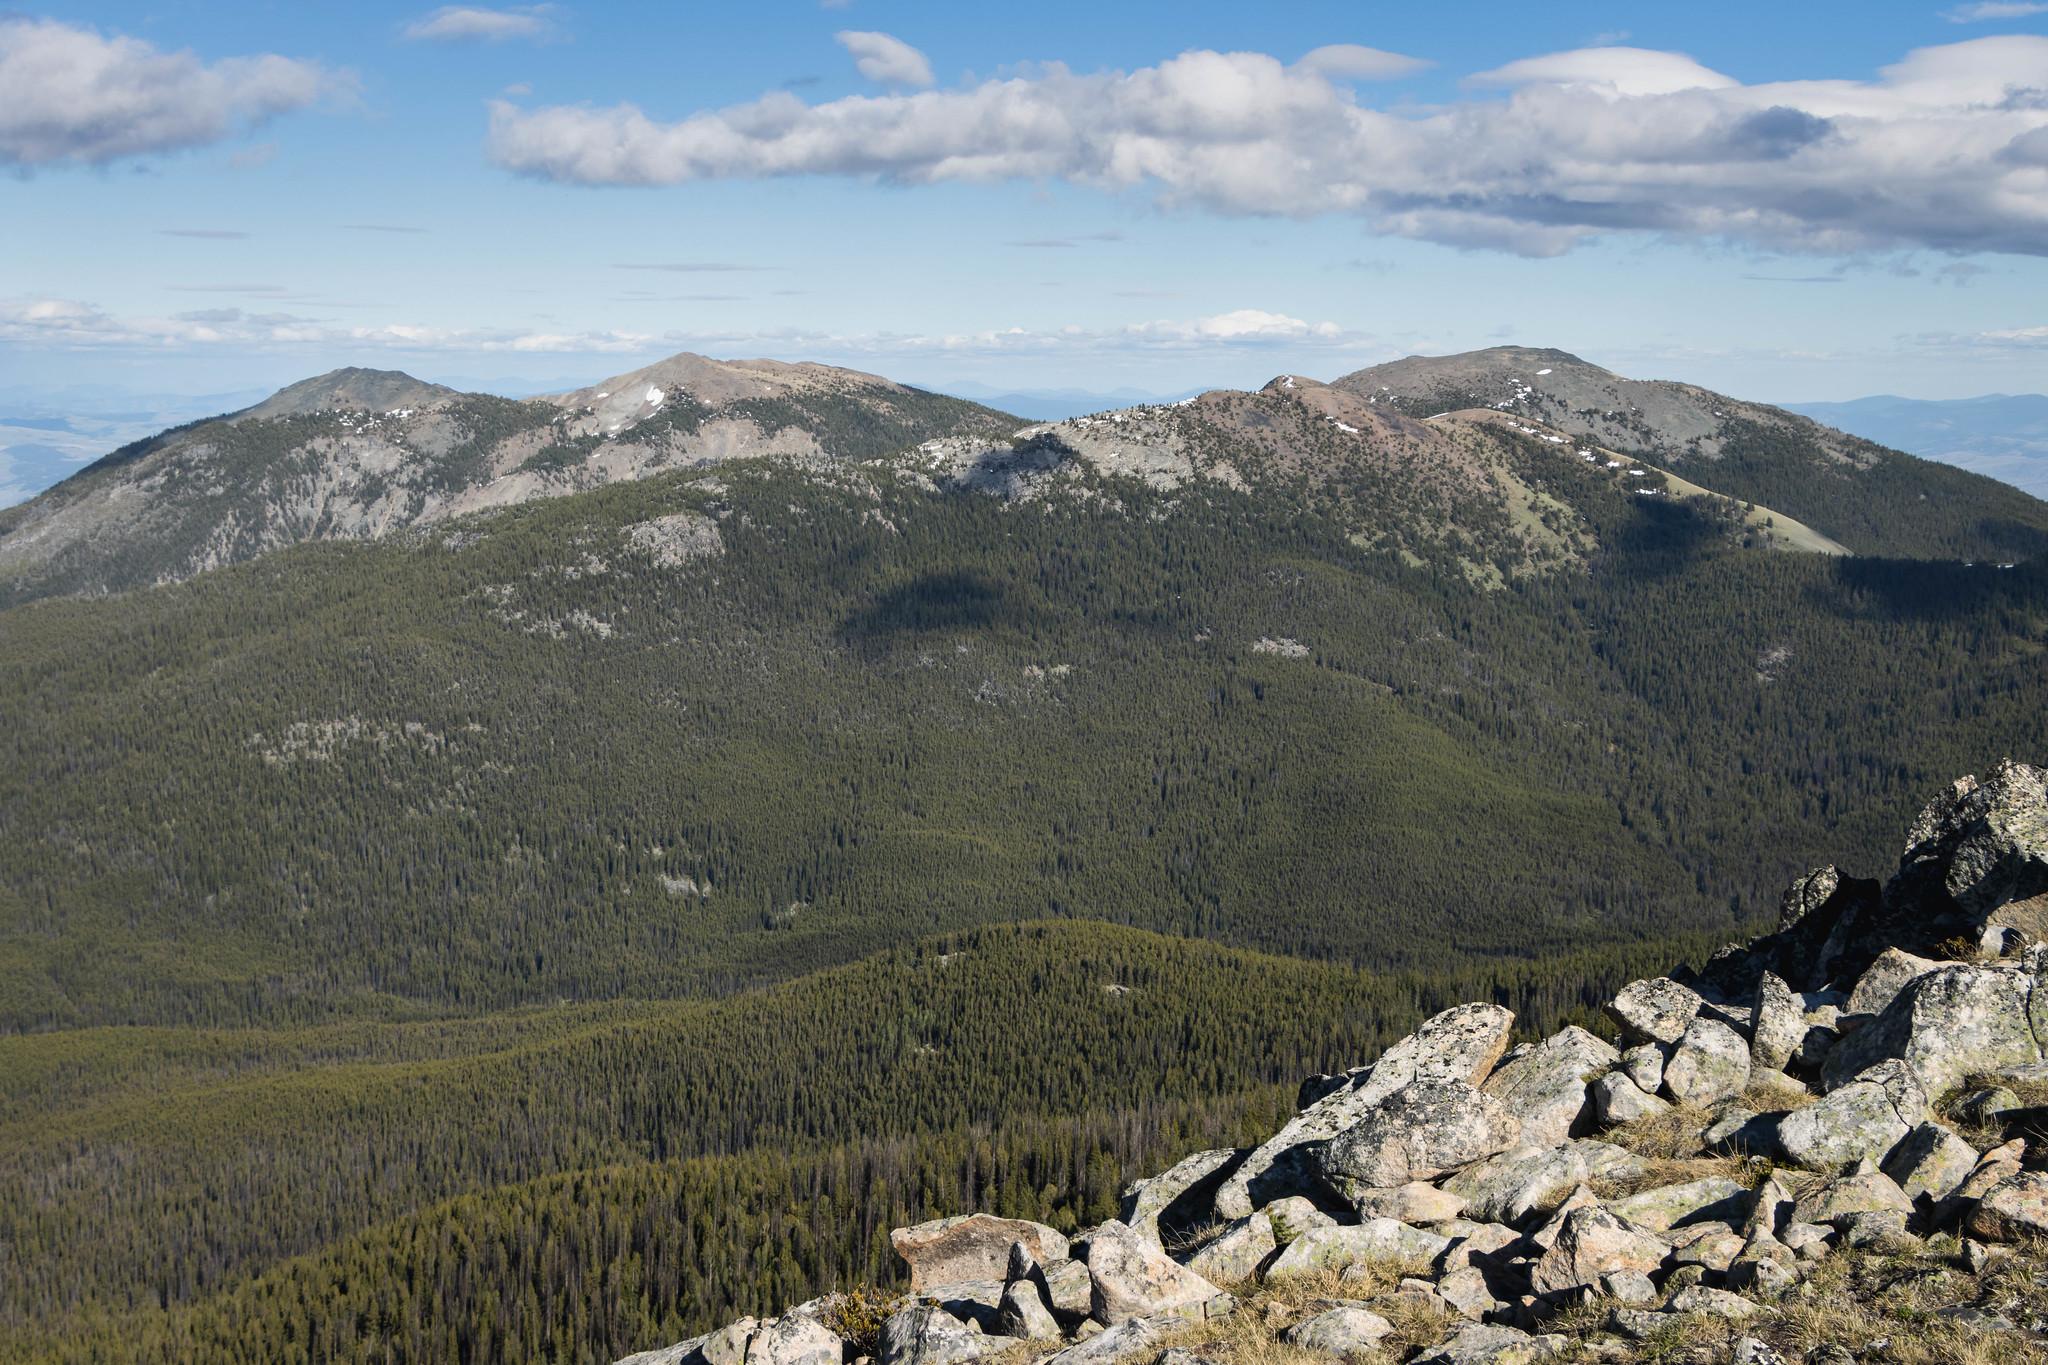 Hurley Peak, Joe Mills Mountain, and Chopaka Mountain